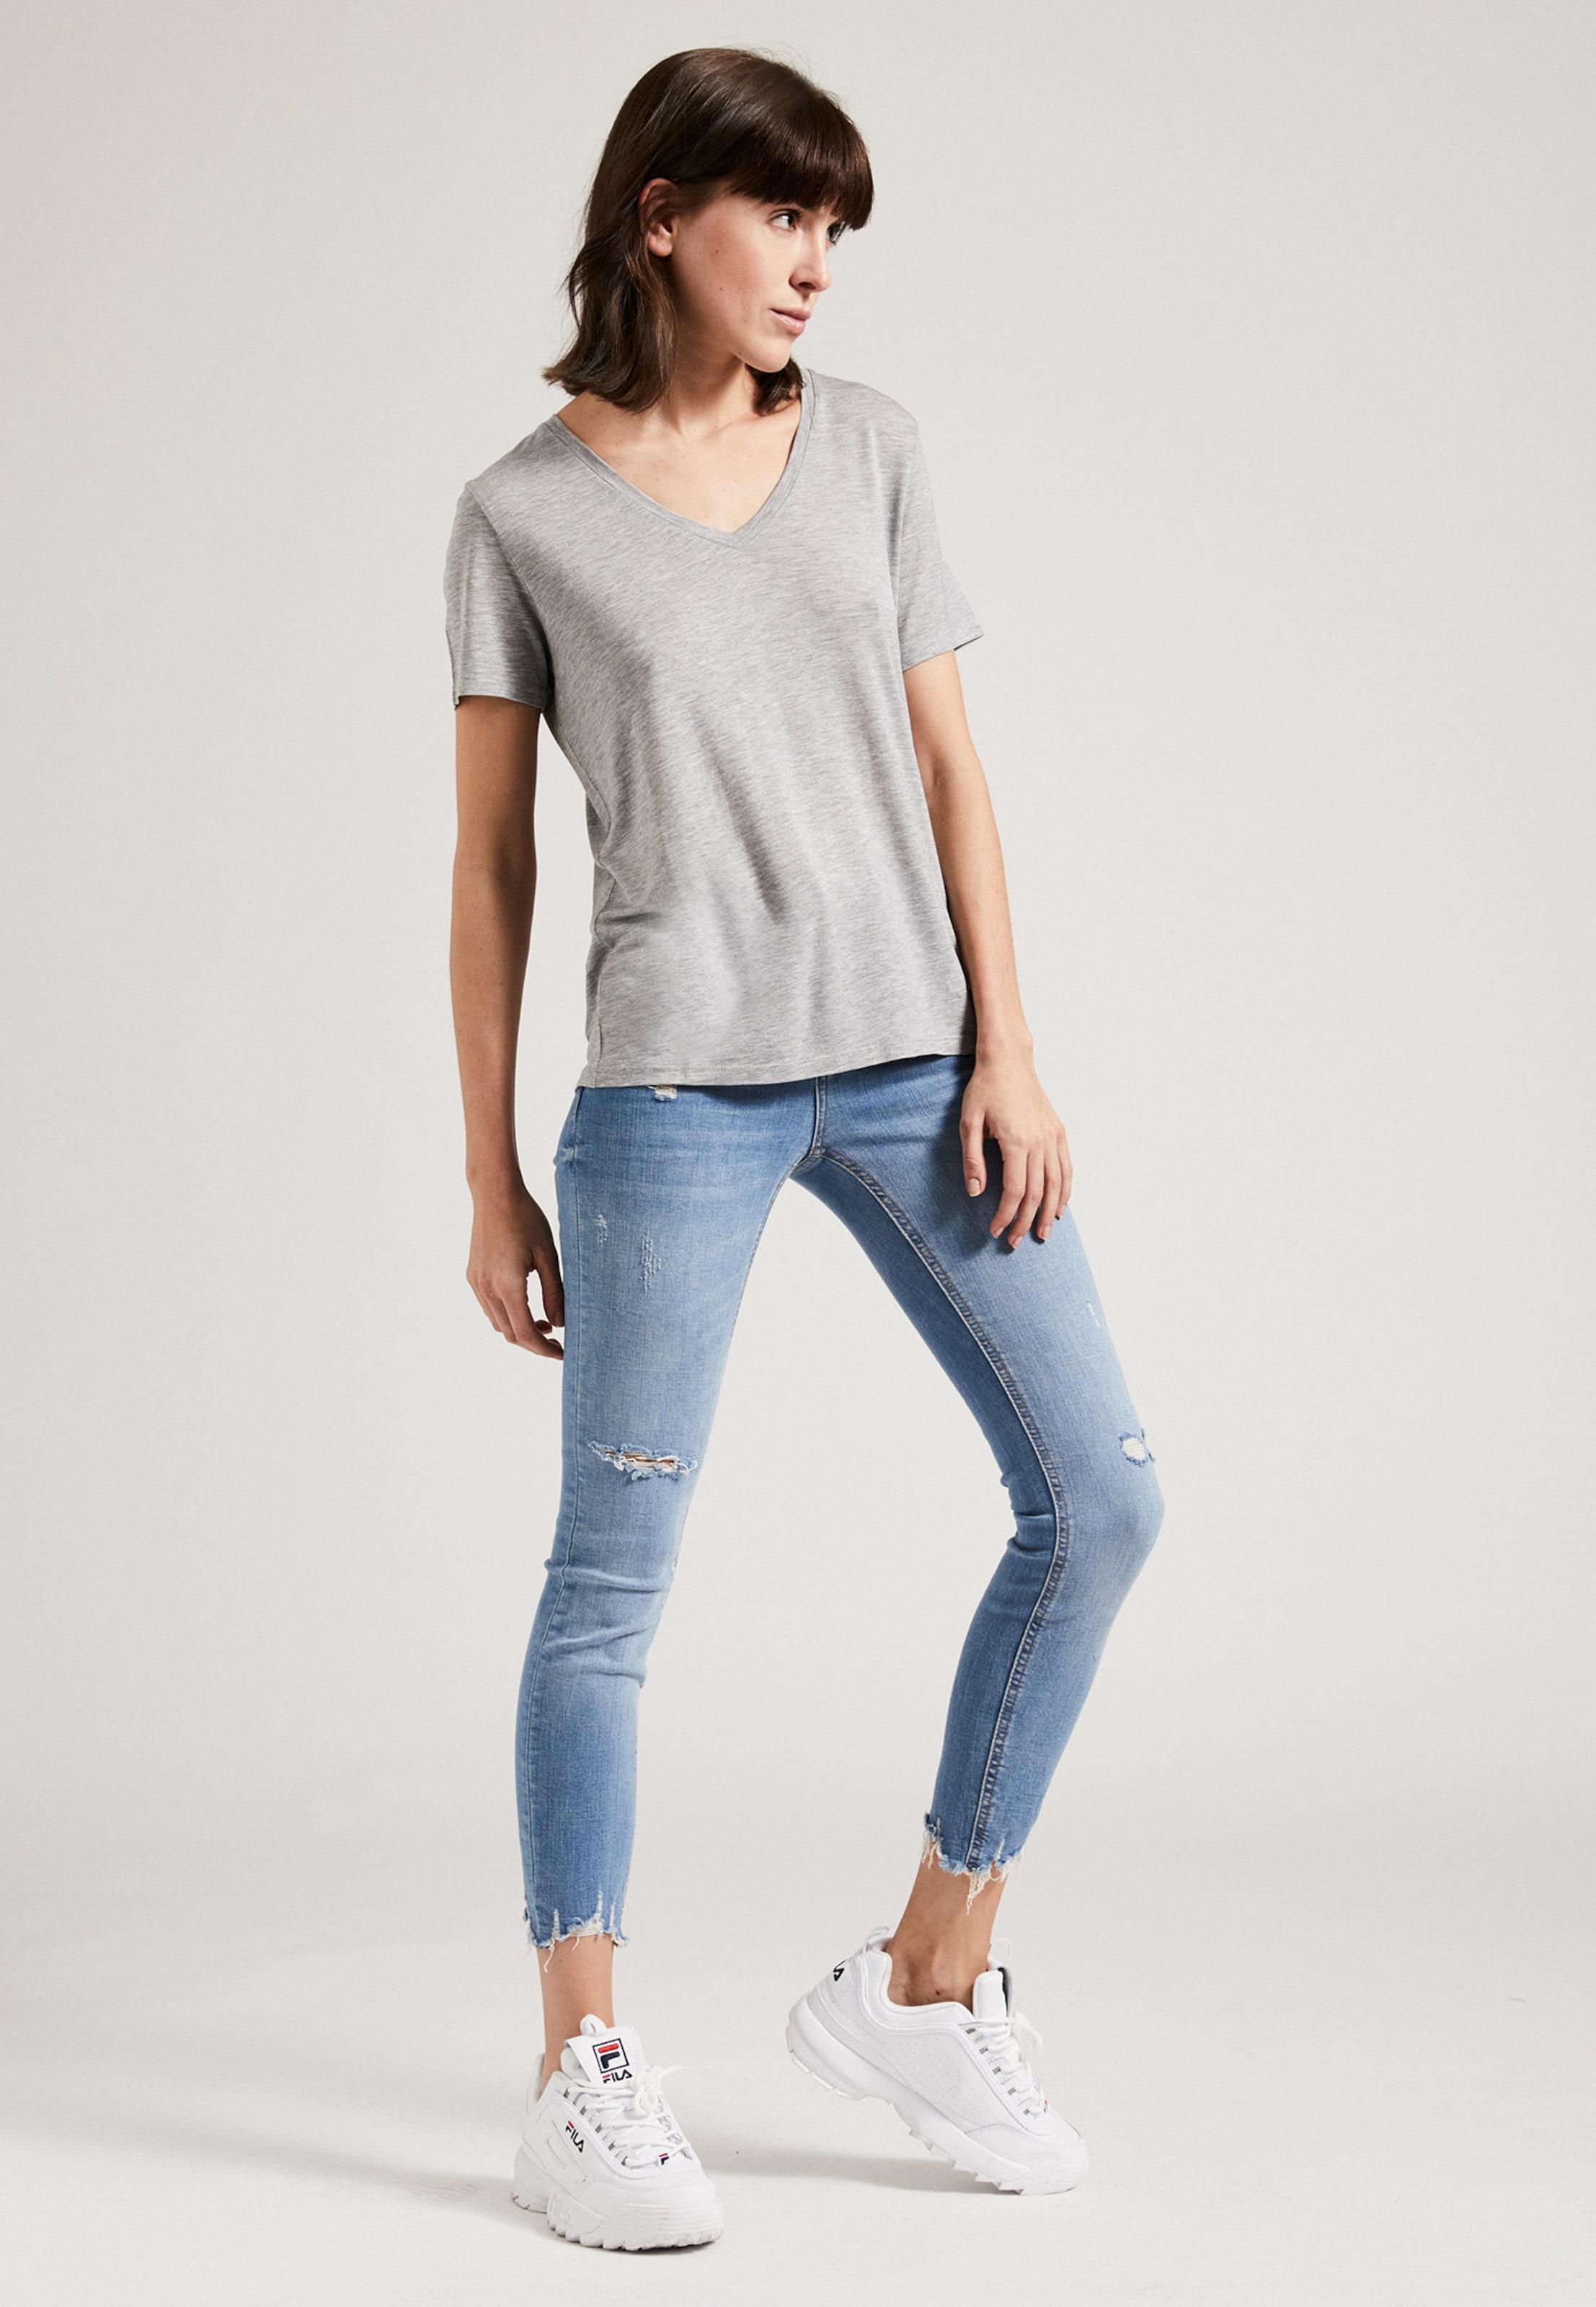 Phyne shirt V The In Weiß neck T Tencel u1clK5JFT3